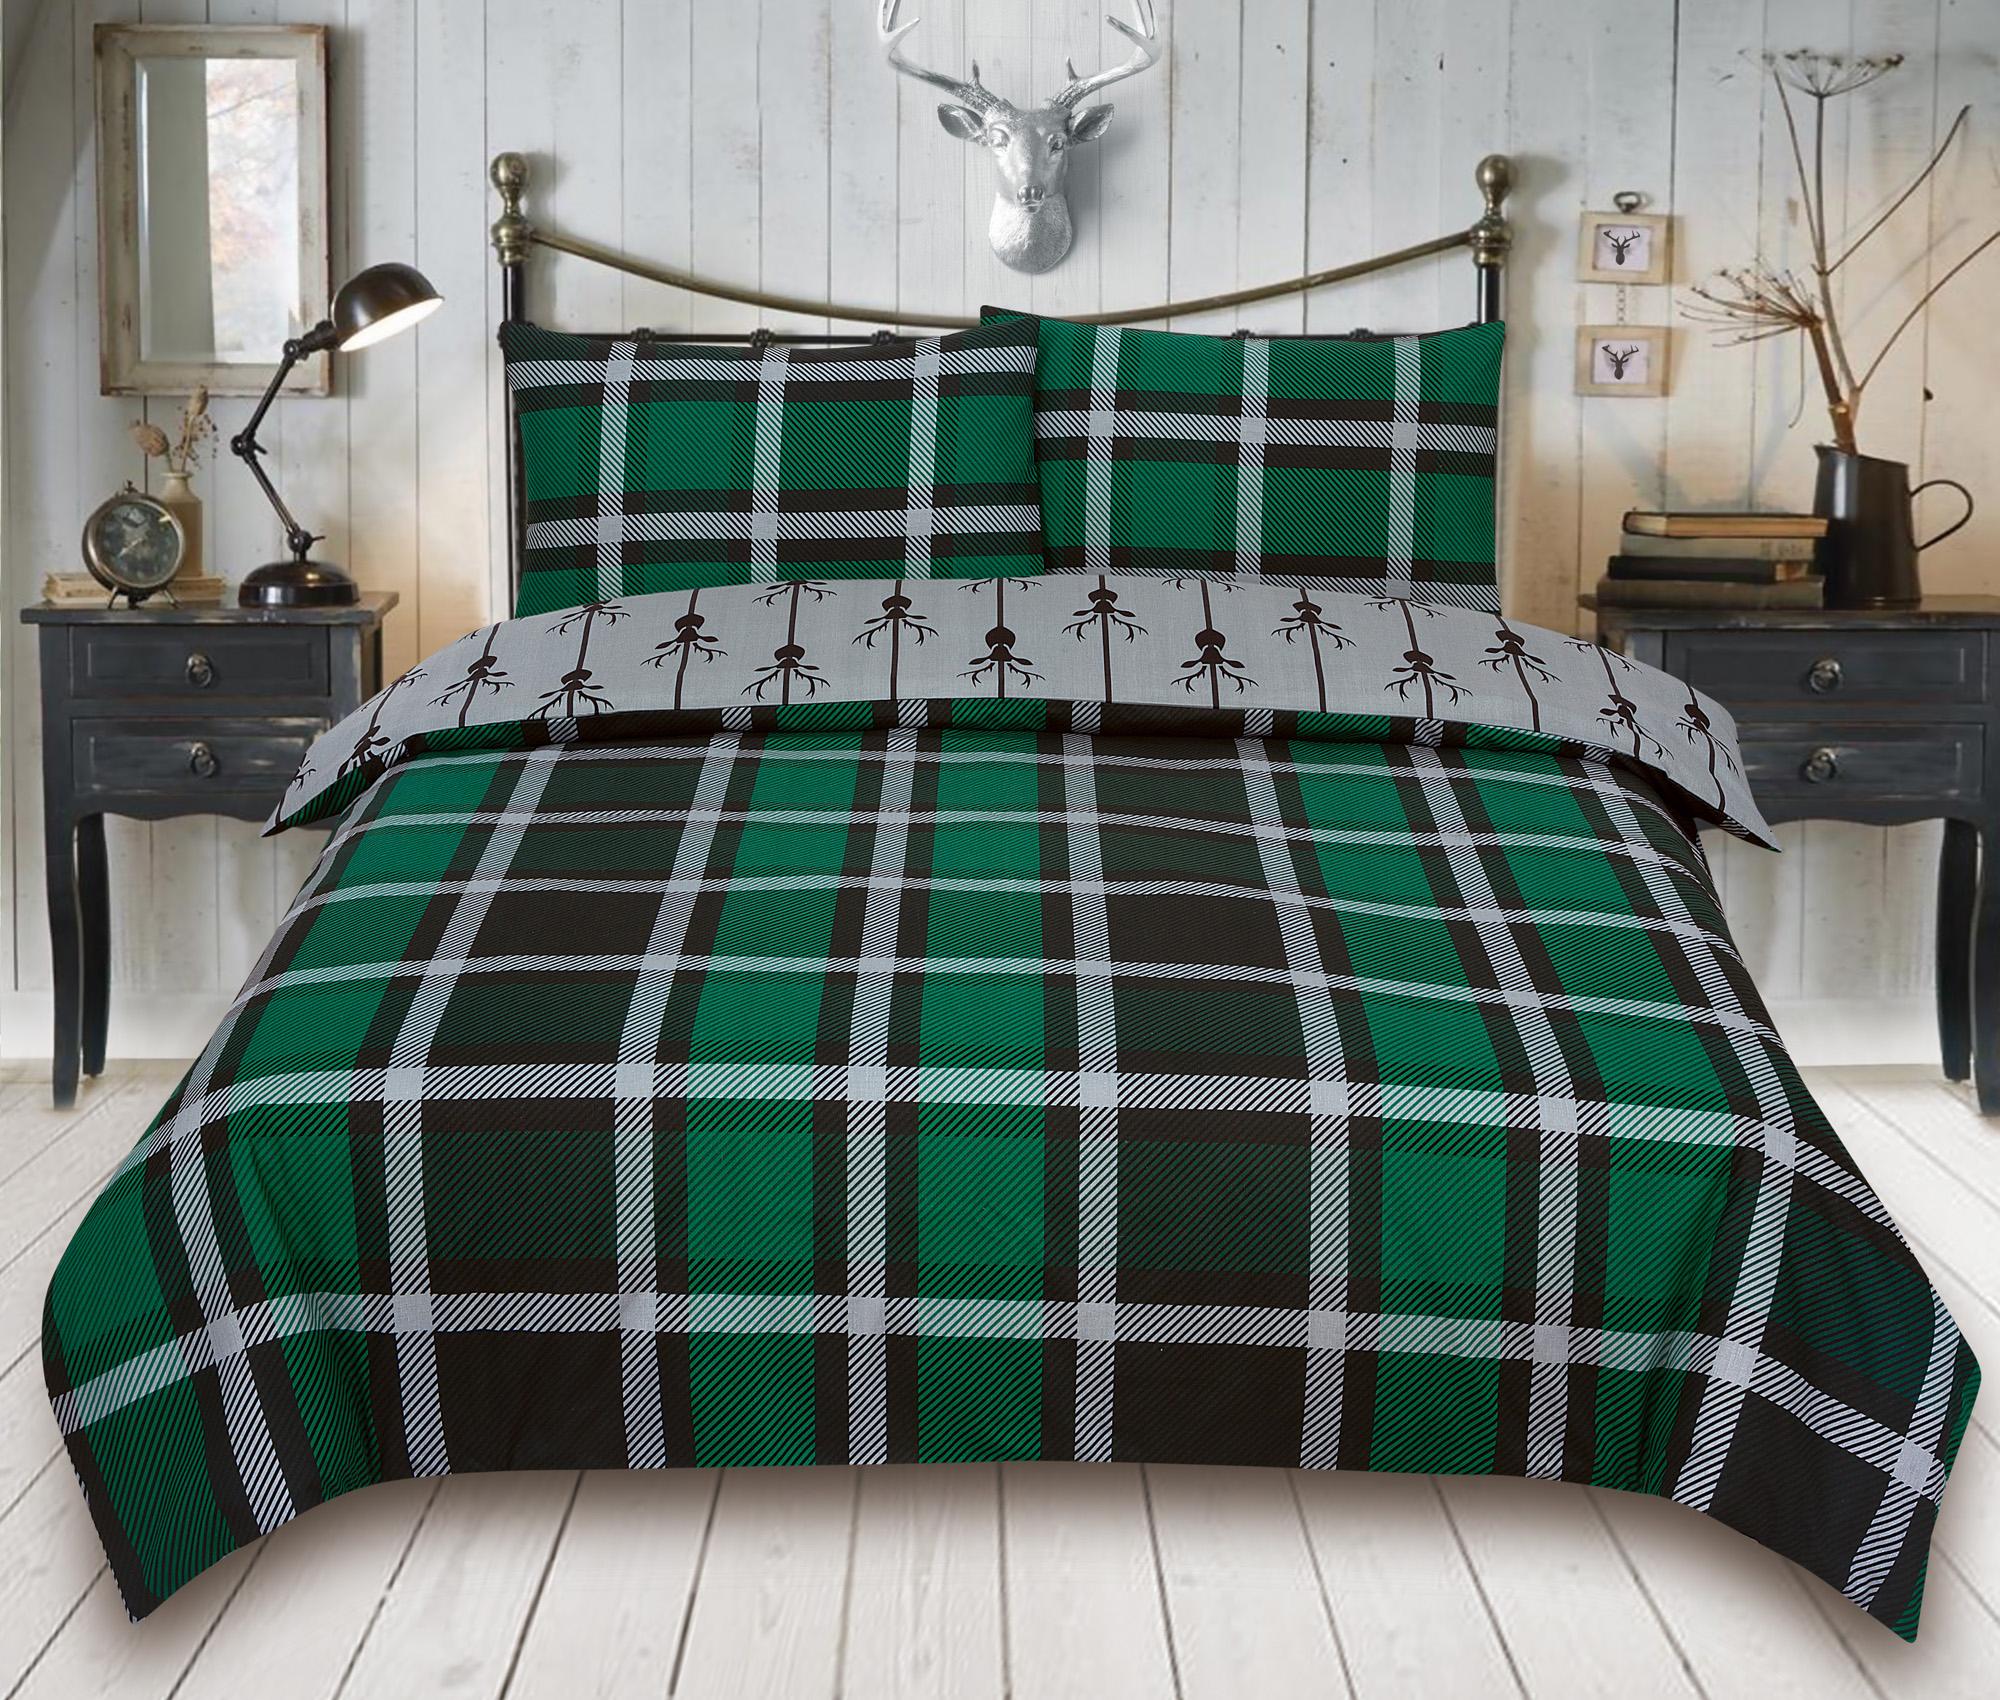 Check-Stag-Tartan-Deer-Antlers-Bedding-Single-Double-King-Duvet-Quilt-Cover-Set miniatura 12